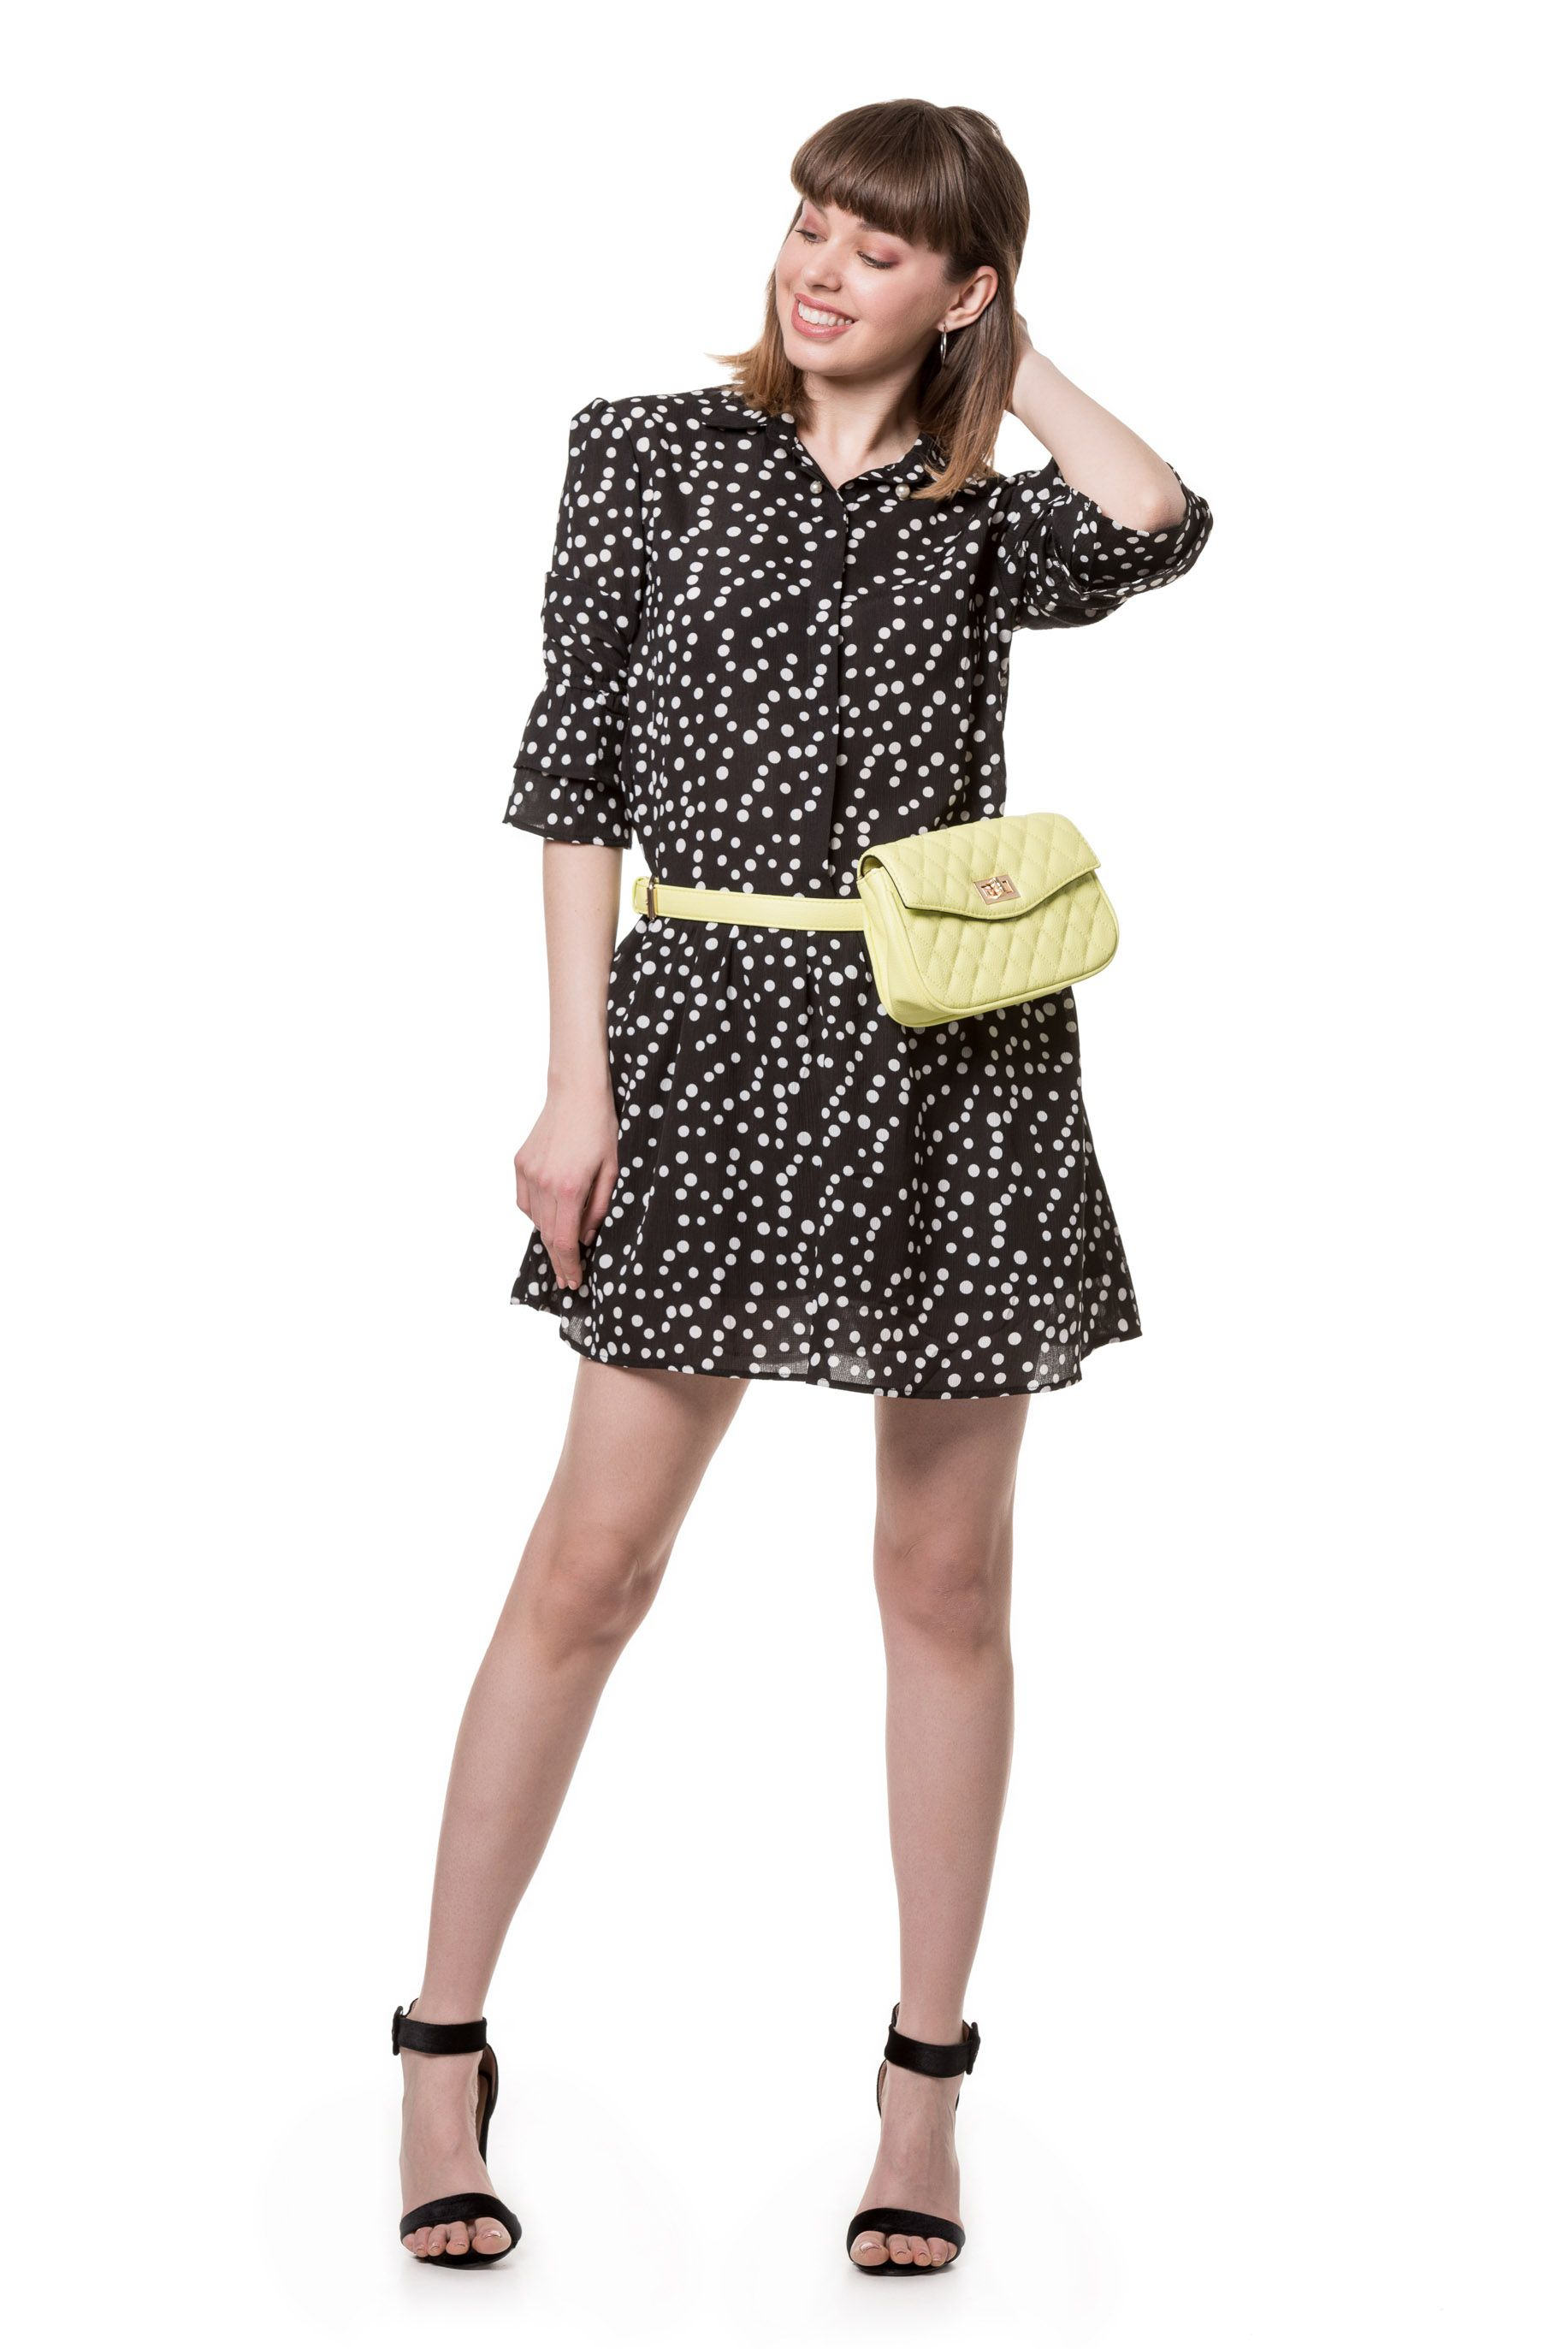 36c451ab4514 Φόρεμα πουά Φόρεμα πουά σε γραμμή Α με κουμπιά εμπρός ΠΕΡΙΓΡΑΦΗ Φόρεμα πουά  σε γραμμή Α